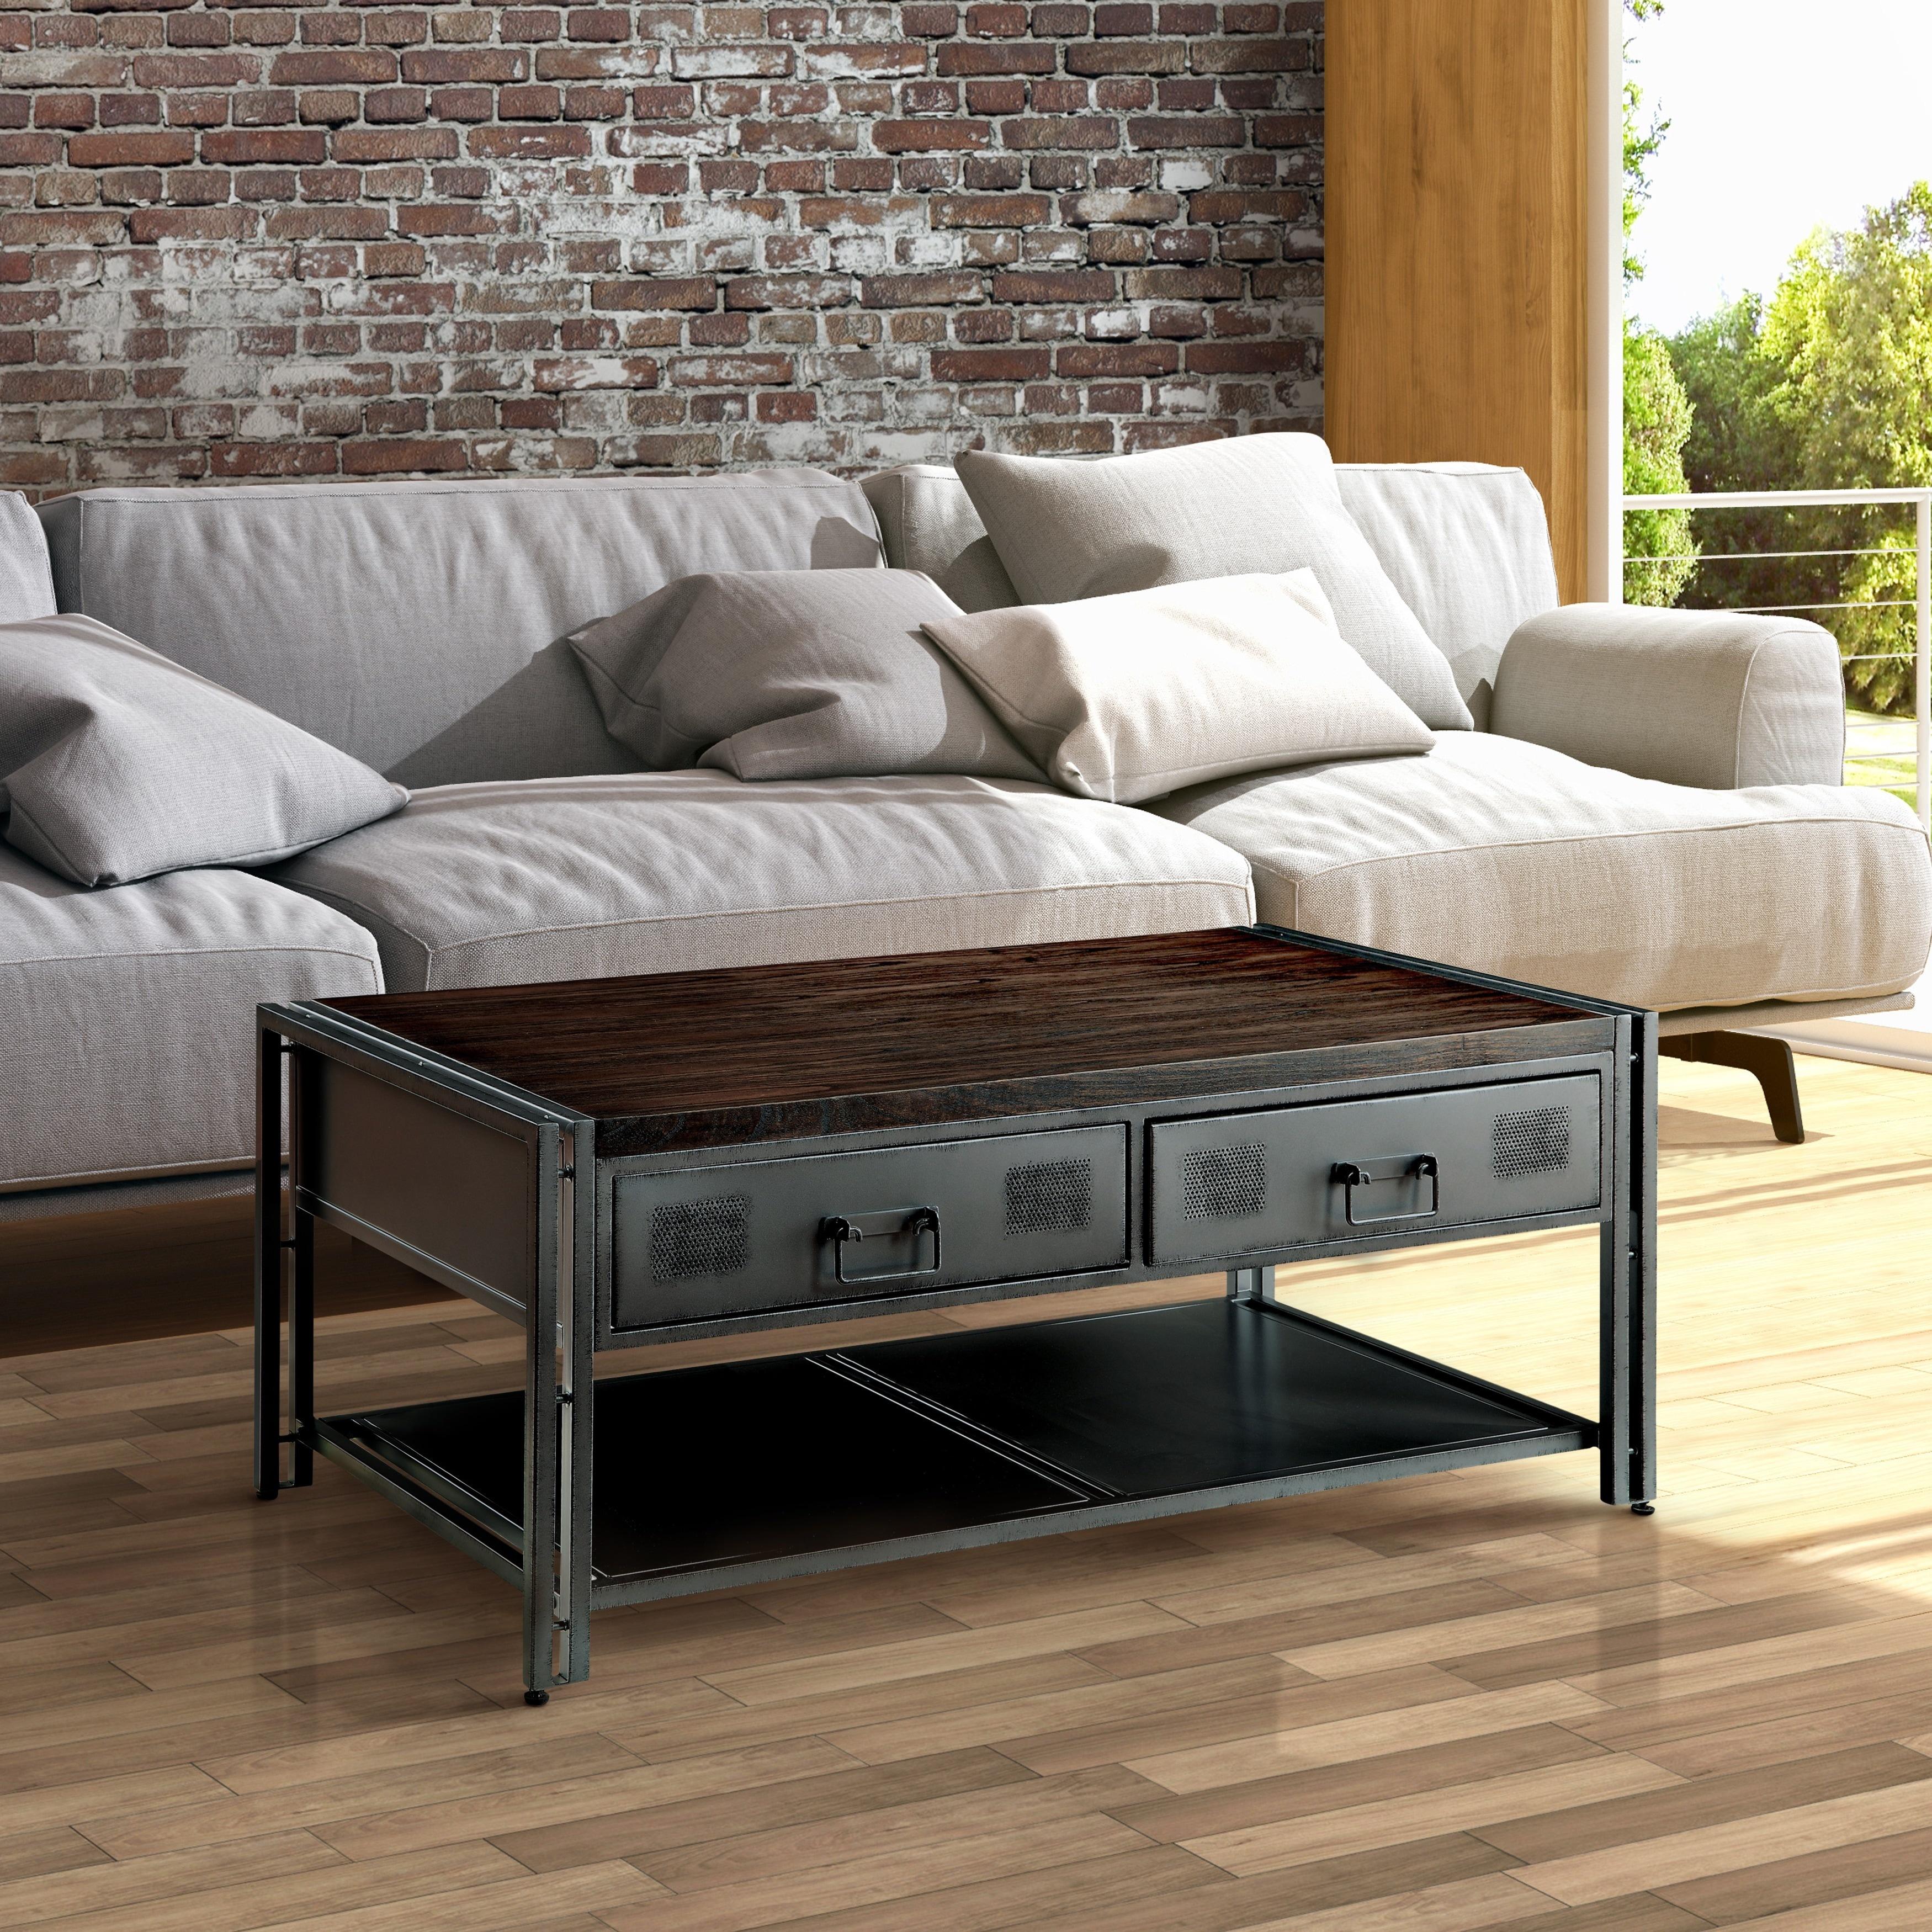 Furniture of America Starke Industrial Style Grey Silver Metal 2